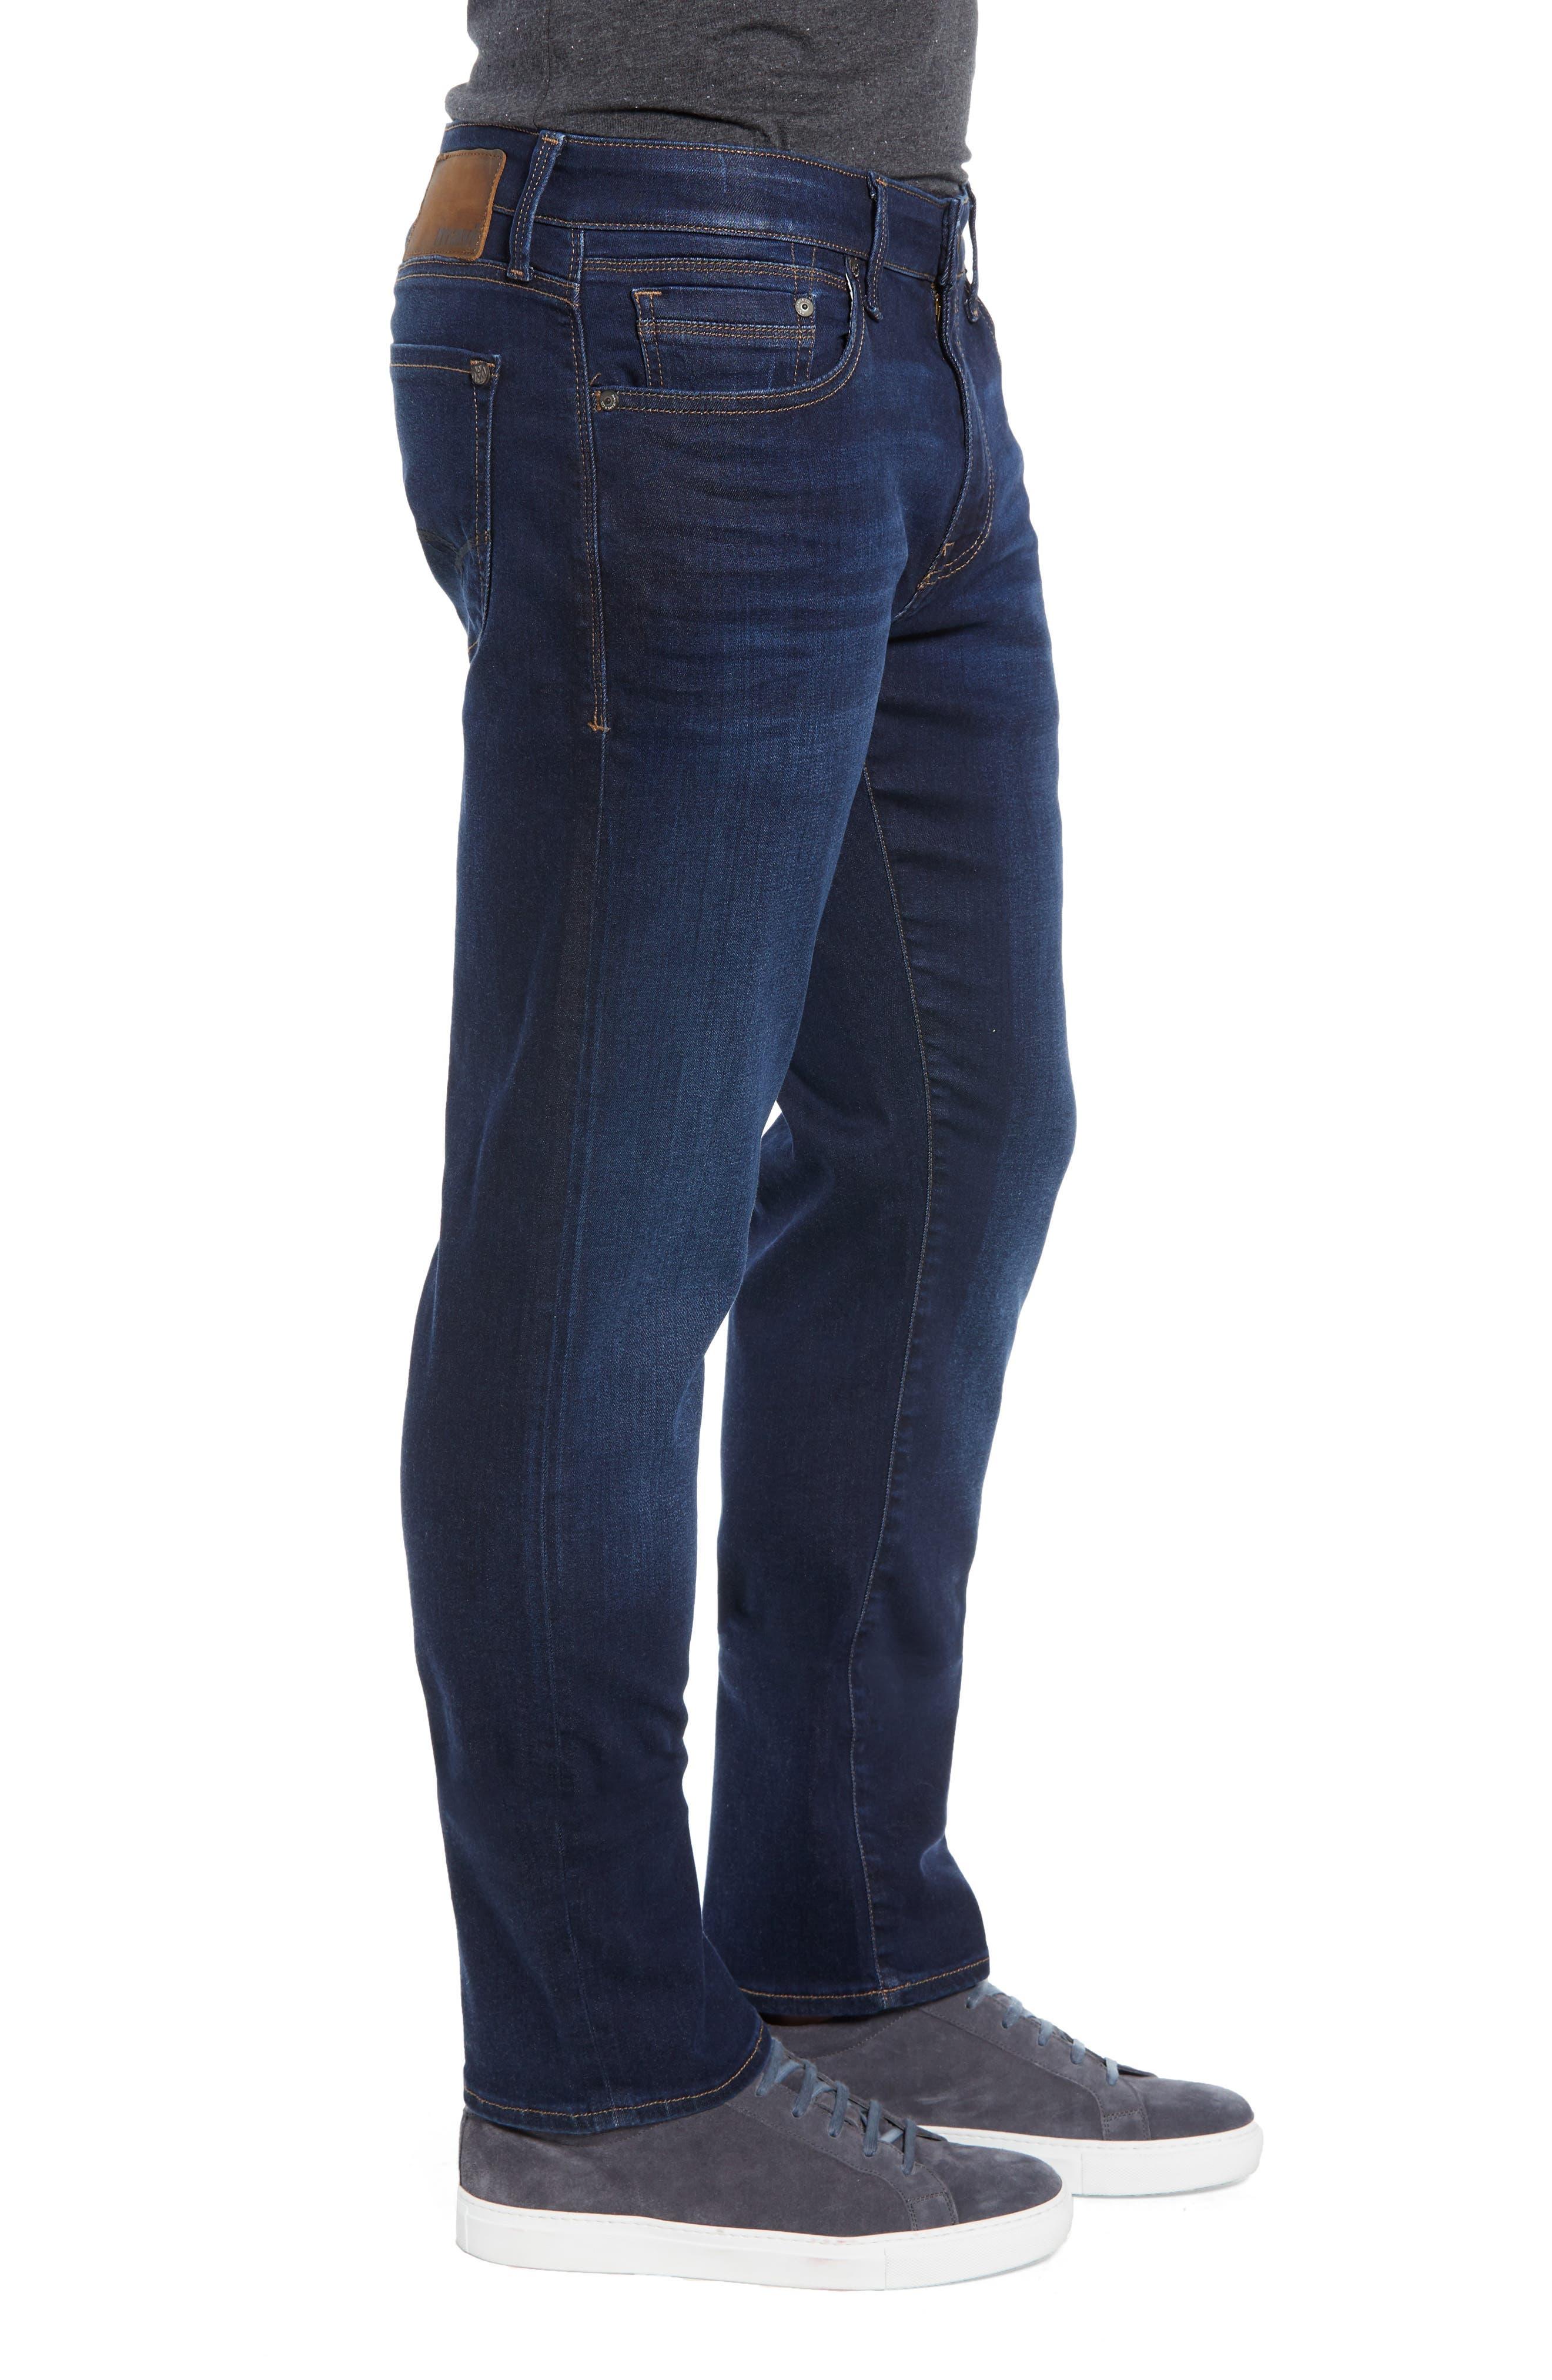 Zach Straight Leg Jeans,                             Alternate thumbnail 3, color,                             DEEP SOFT MOVE